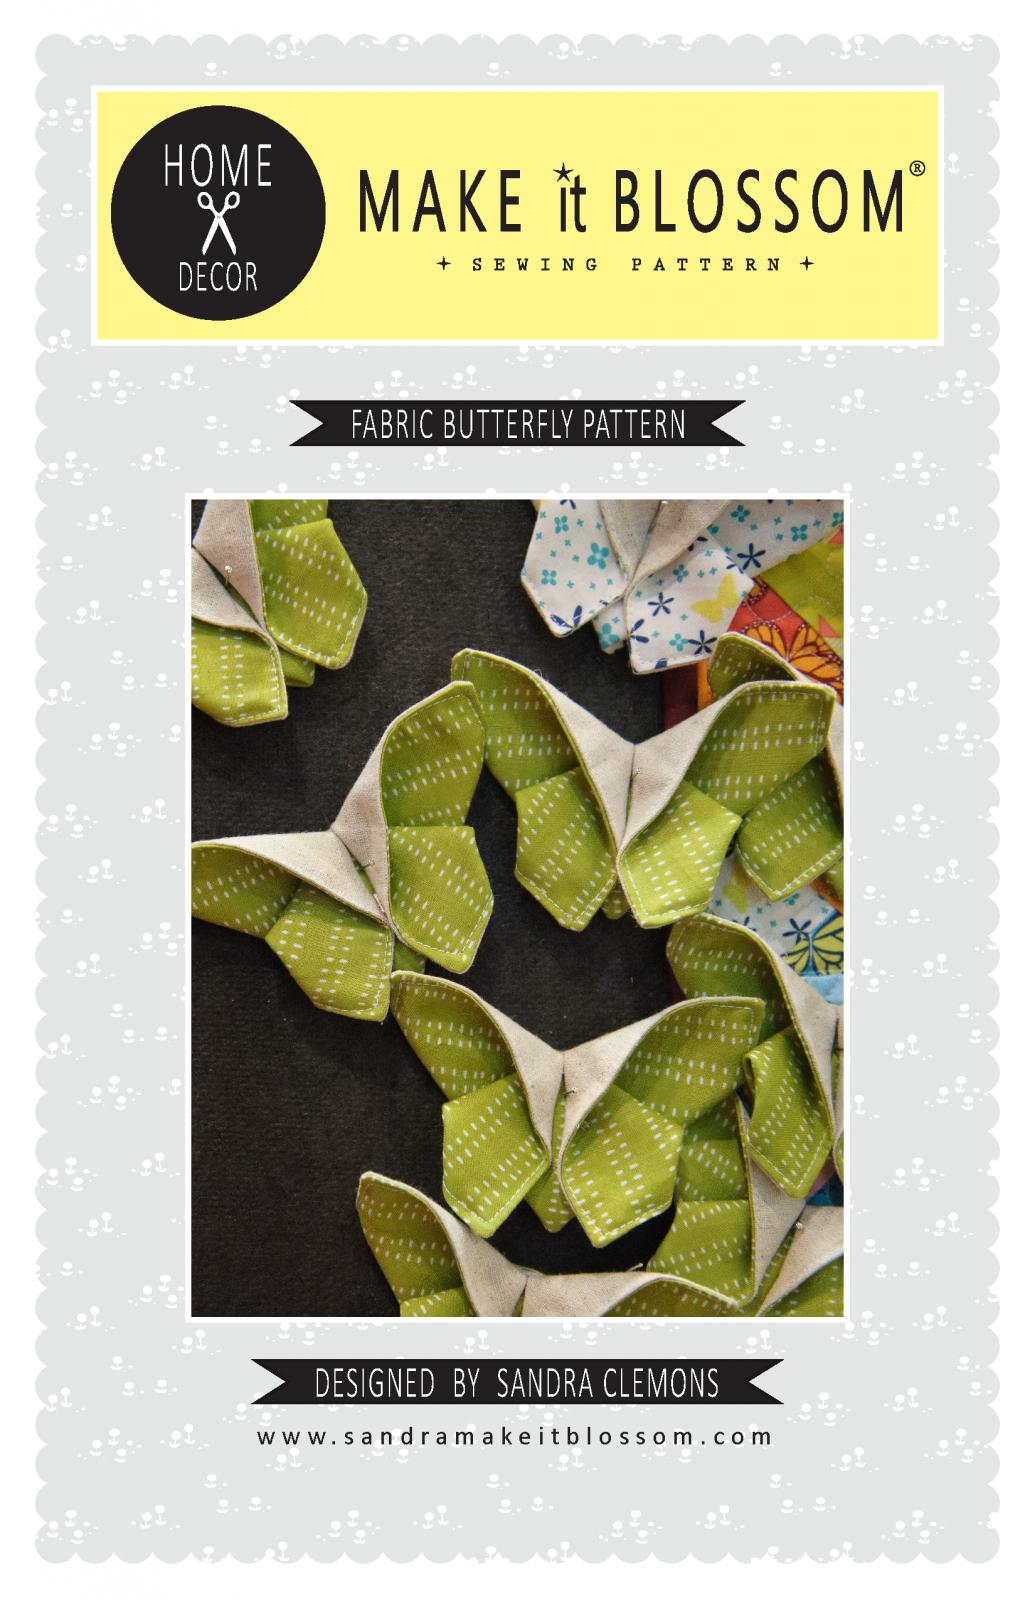 Fabric Butterfly Pattern